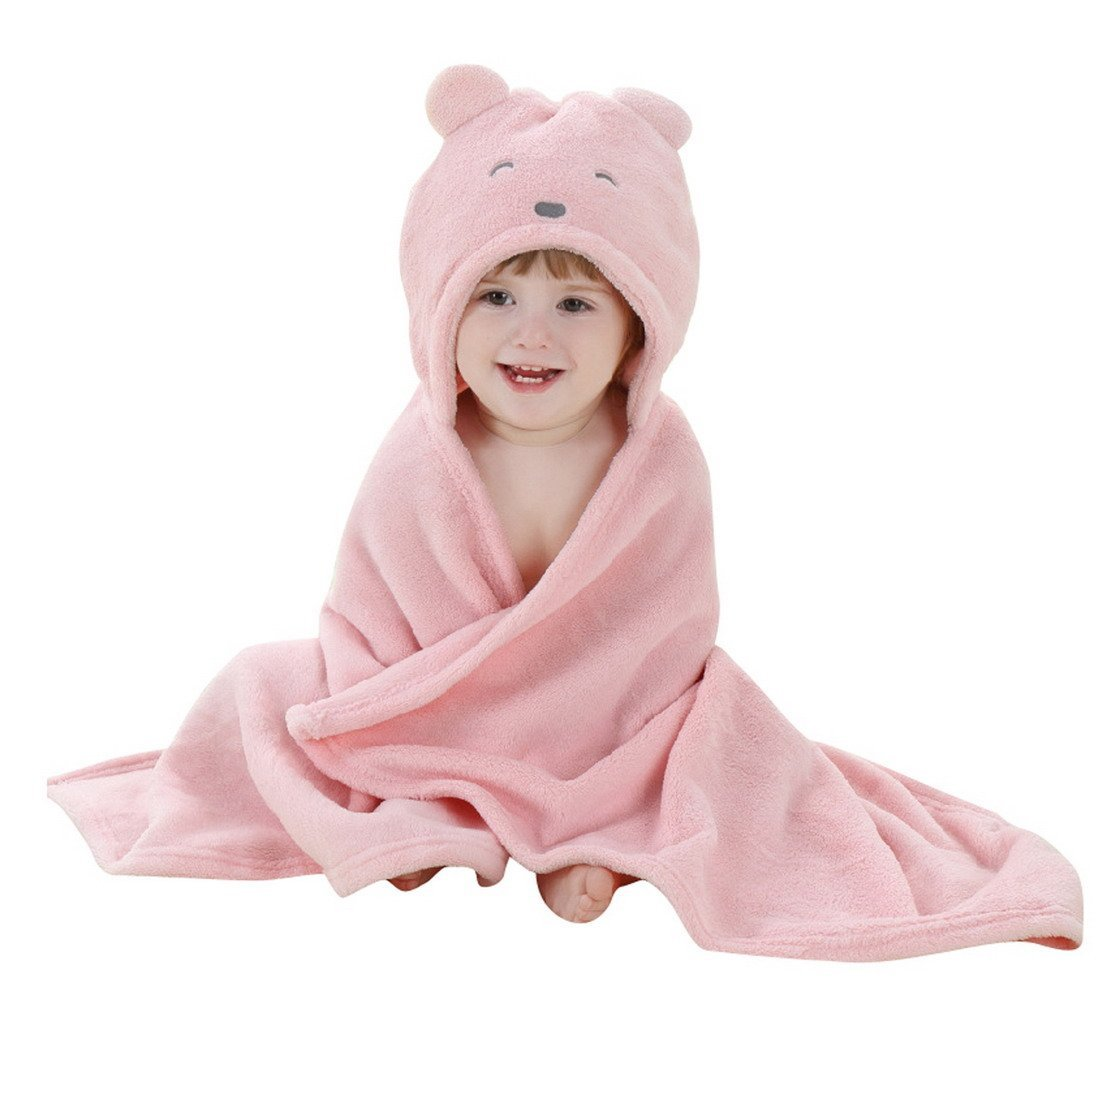 Baby Hooded Bath Towels Animal Bathrobe Fleece Towel Blanket (Pink Bear)